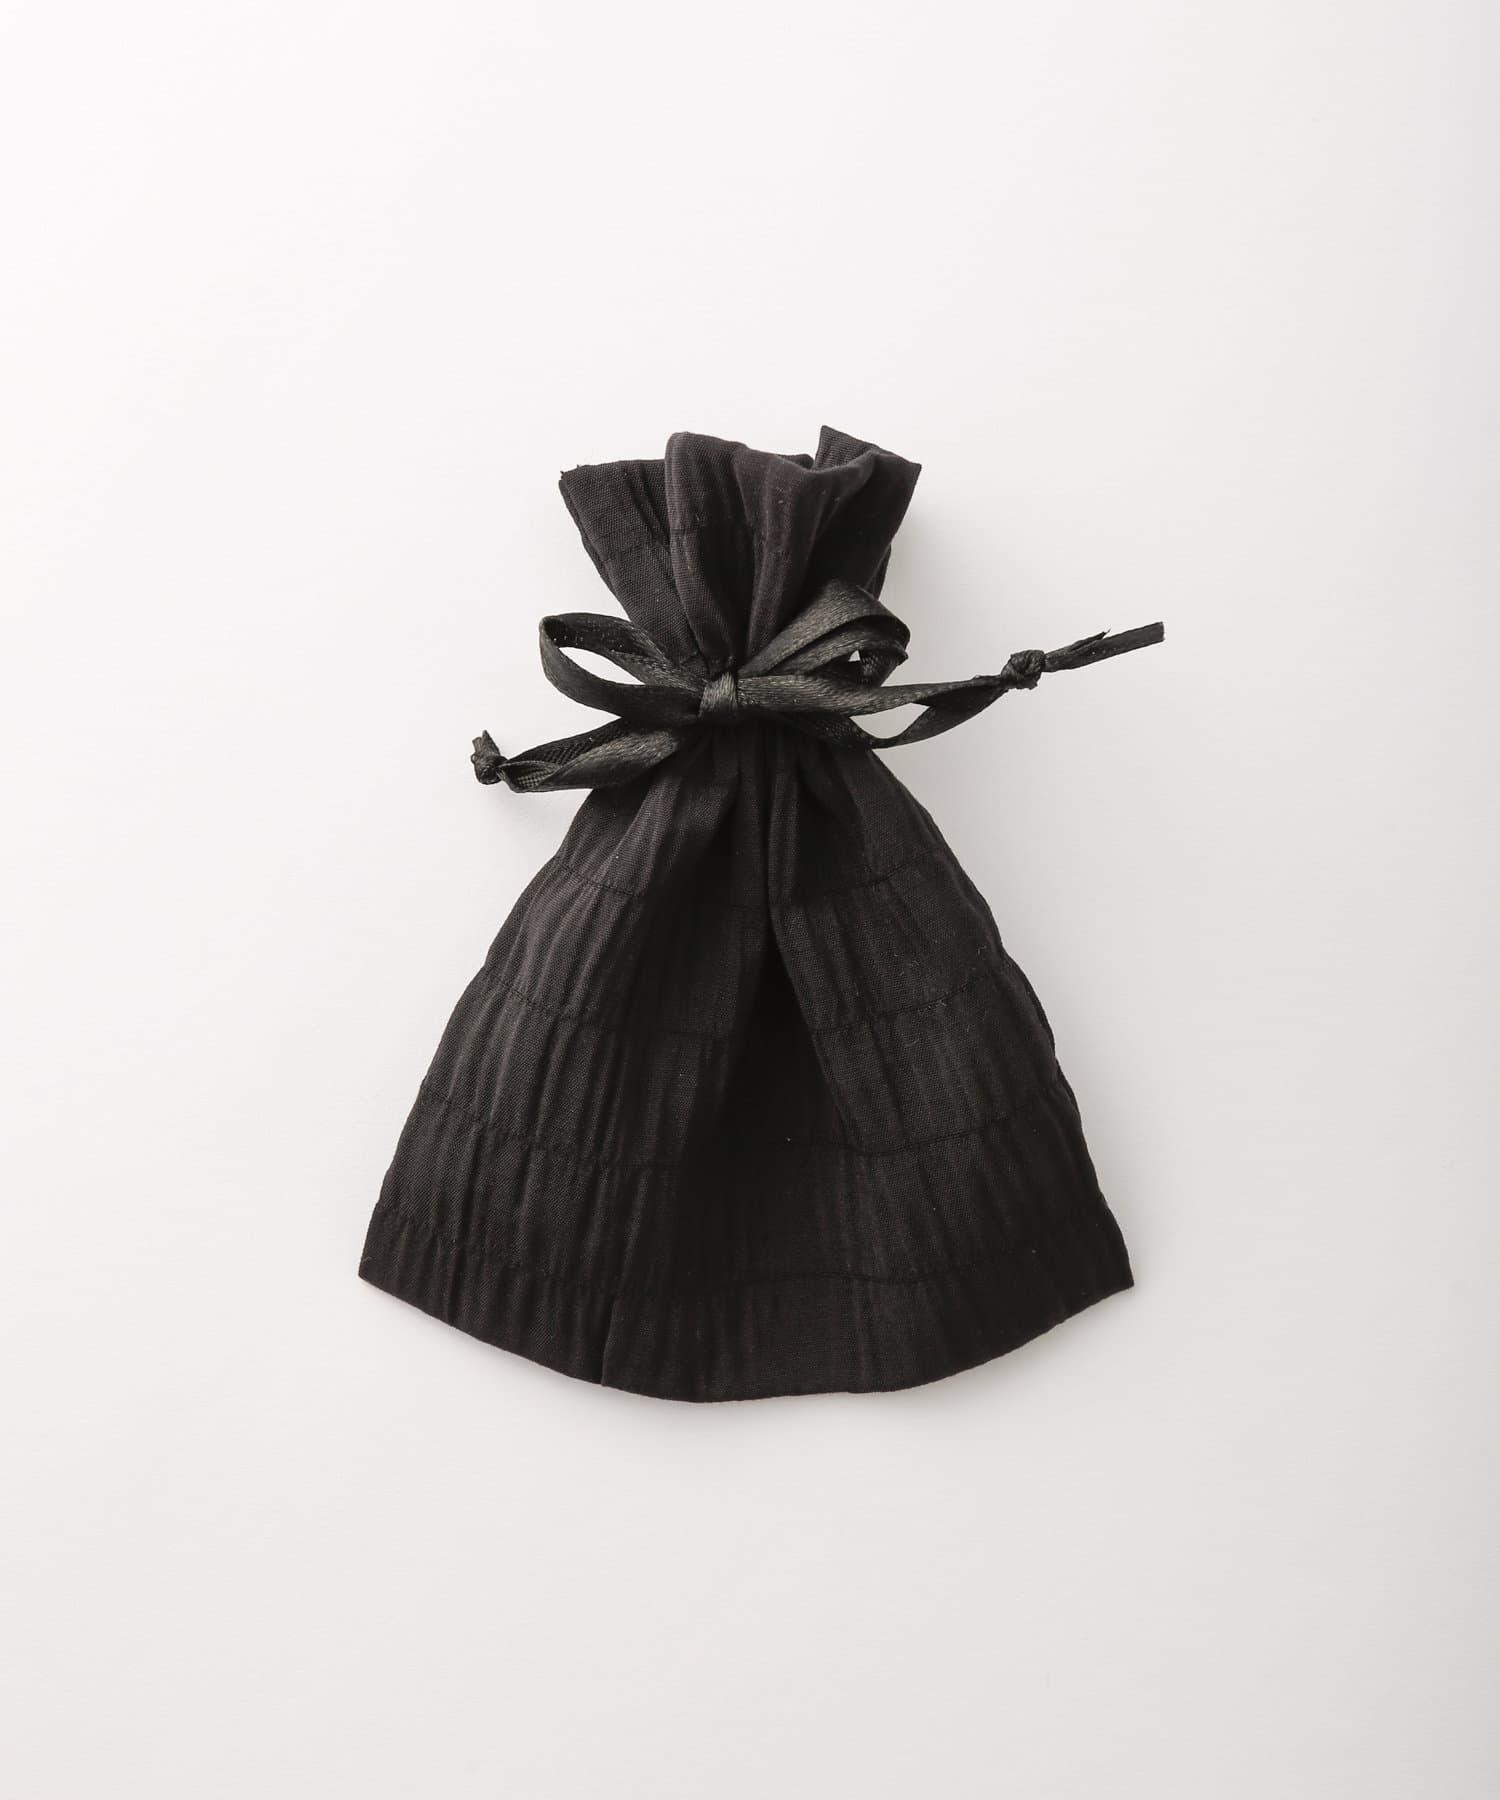 Lattice(ラティス) レディース シャーリング巾着ポーチS ブラック